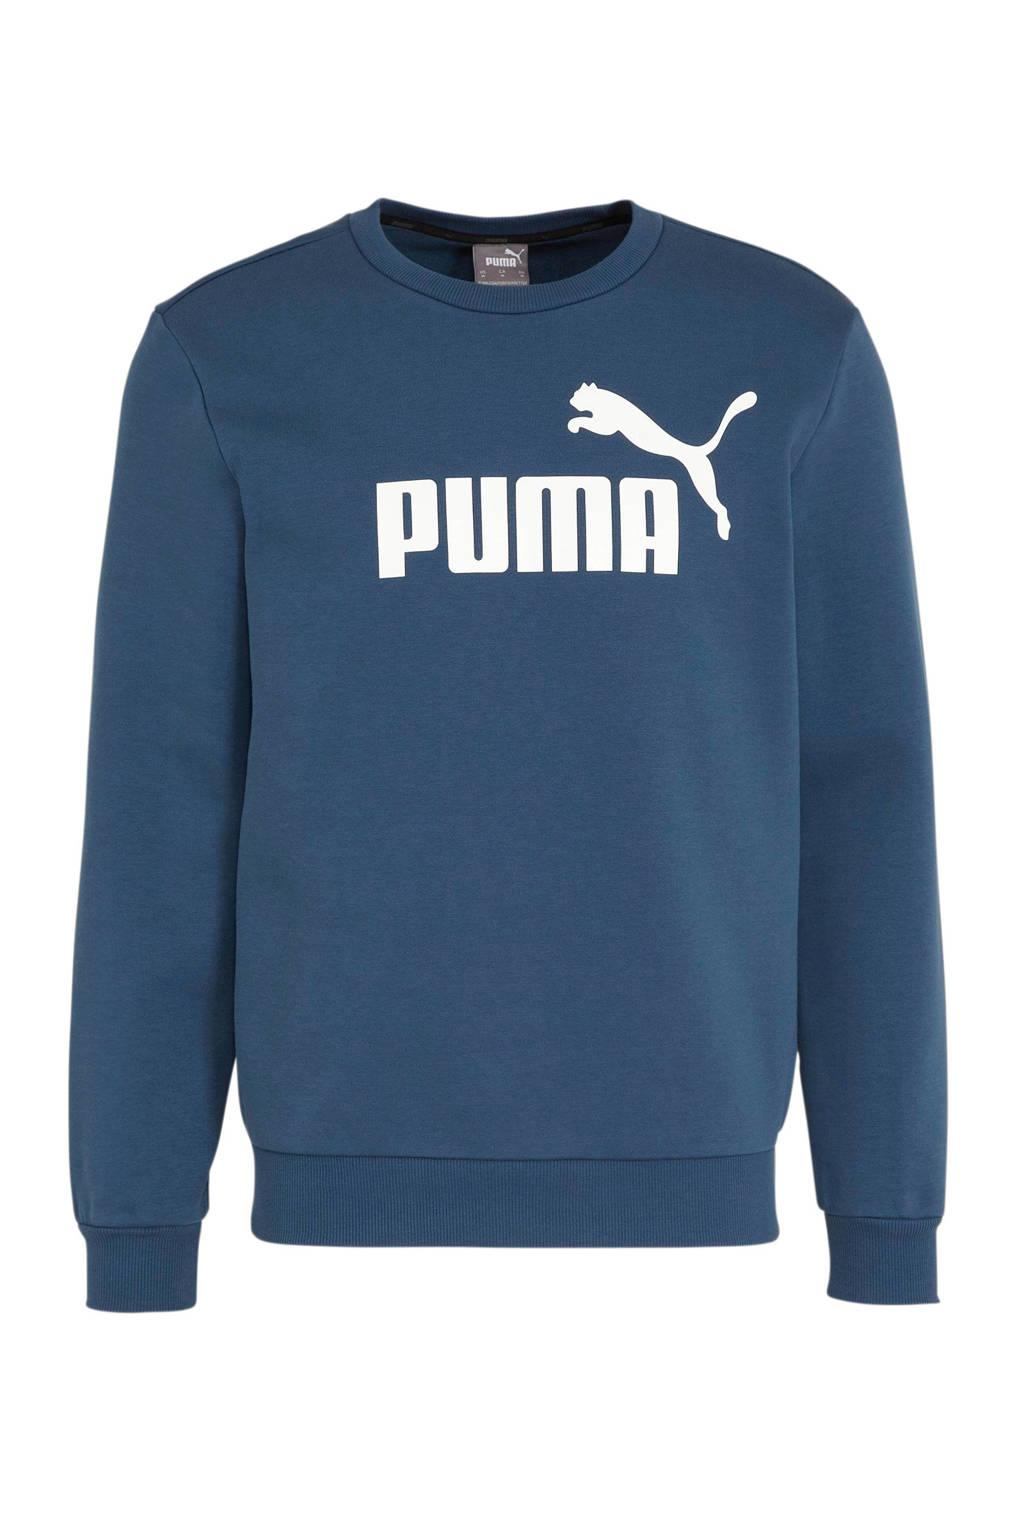 Puma   sweater blauw, Blauw